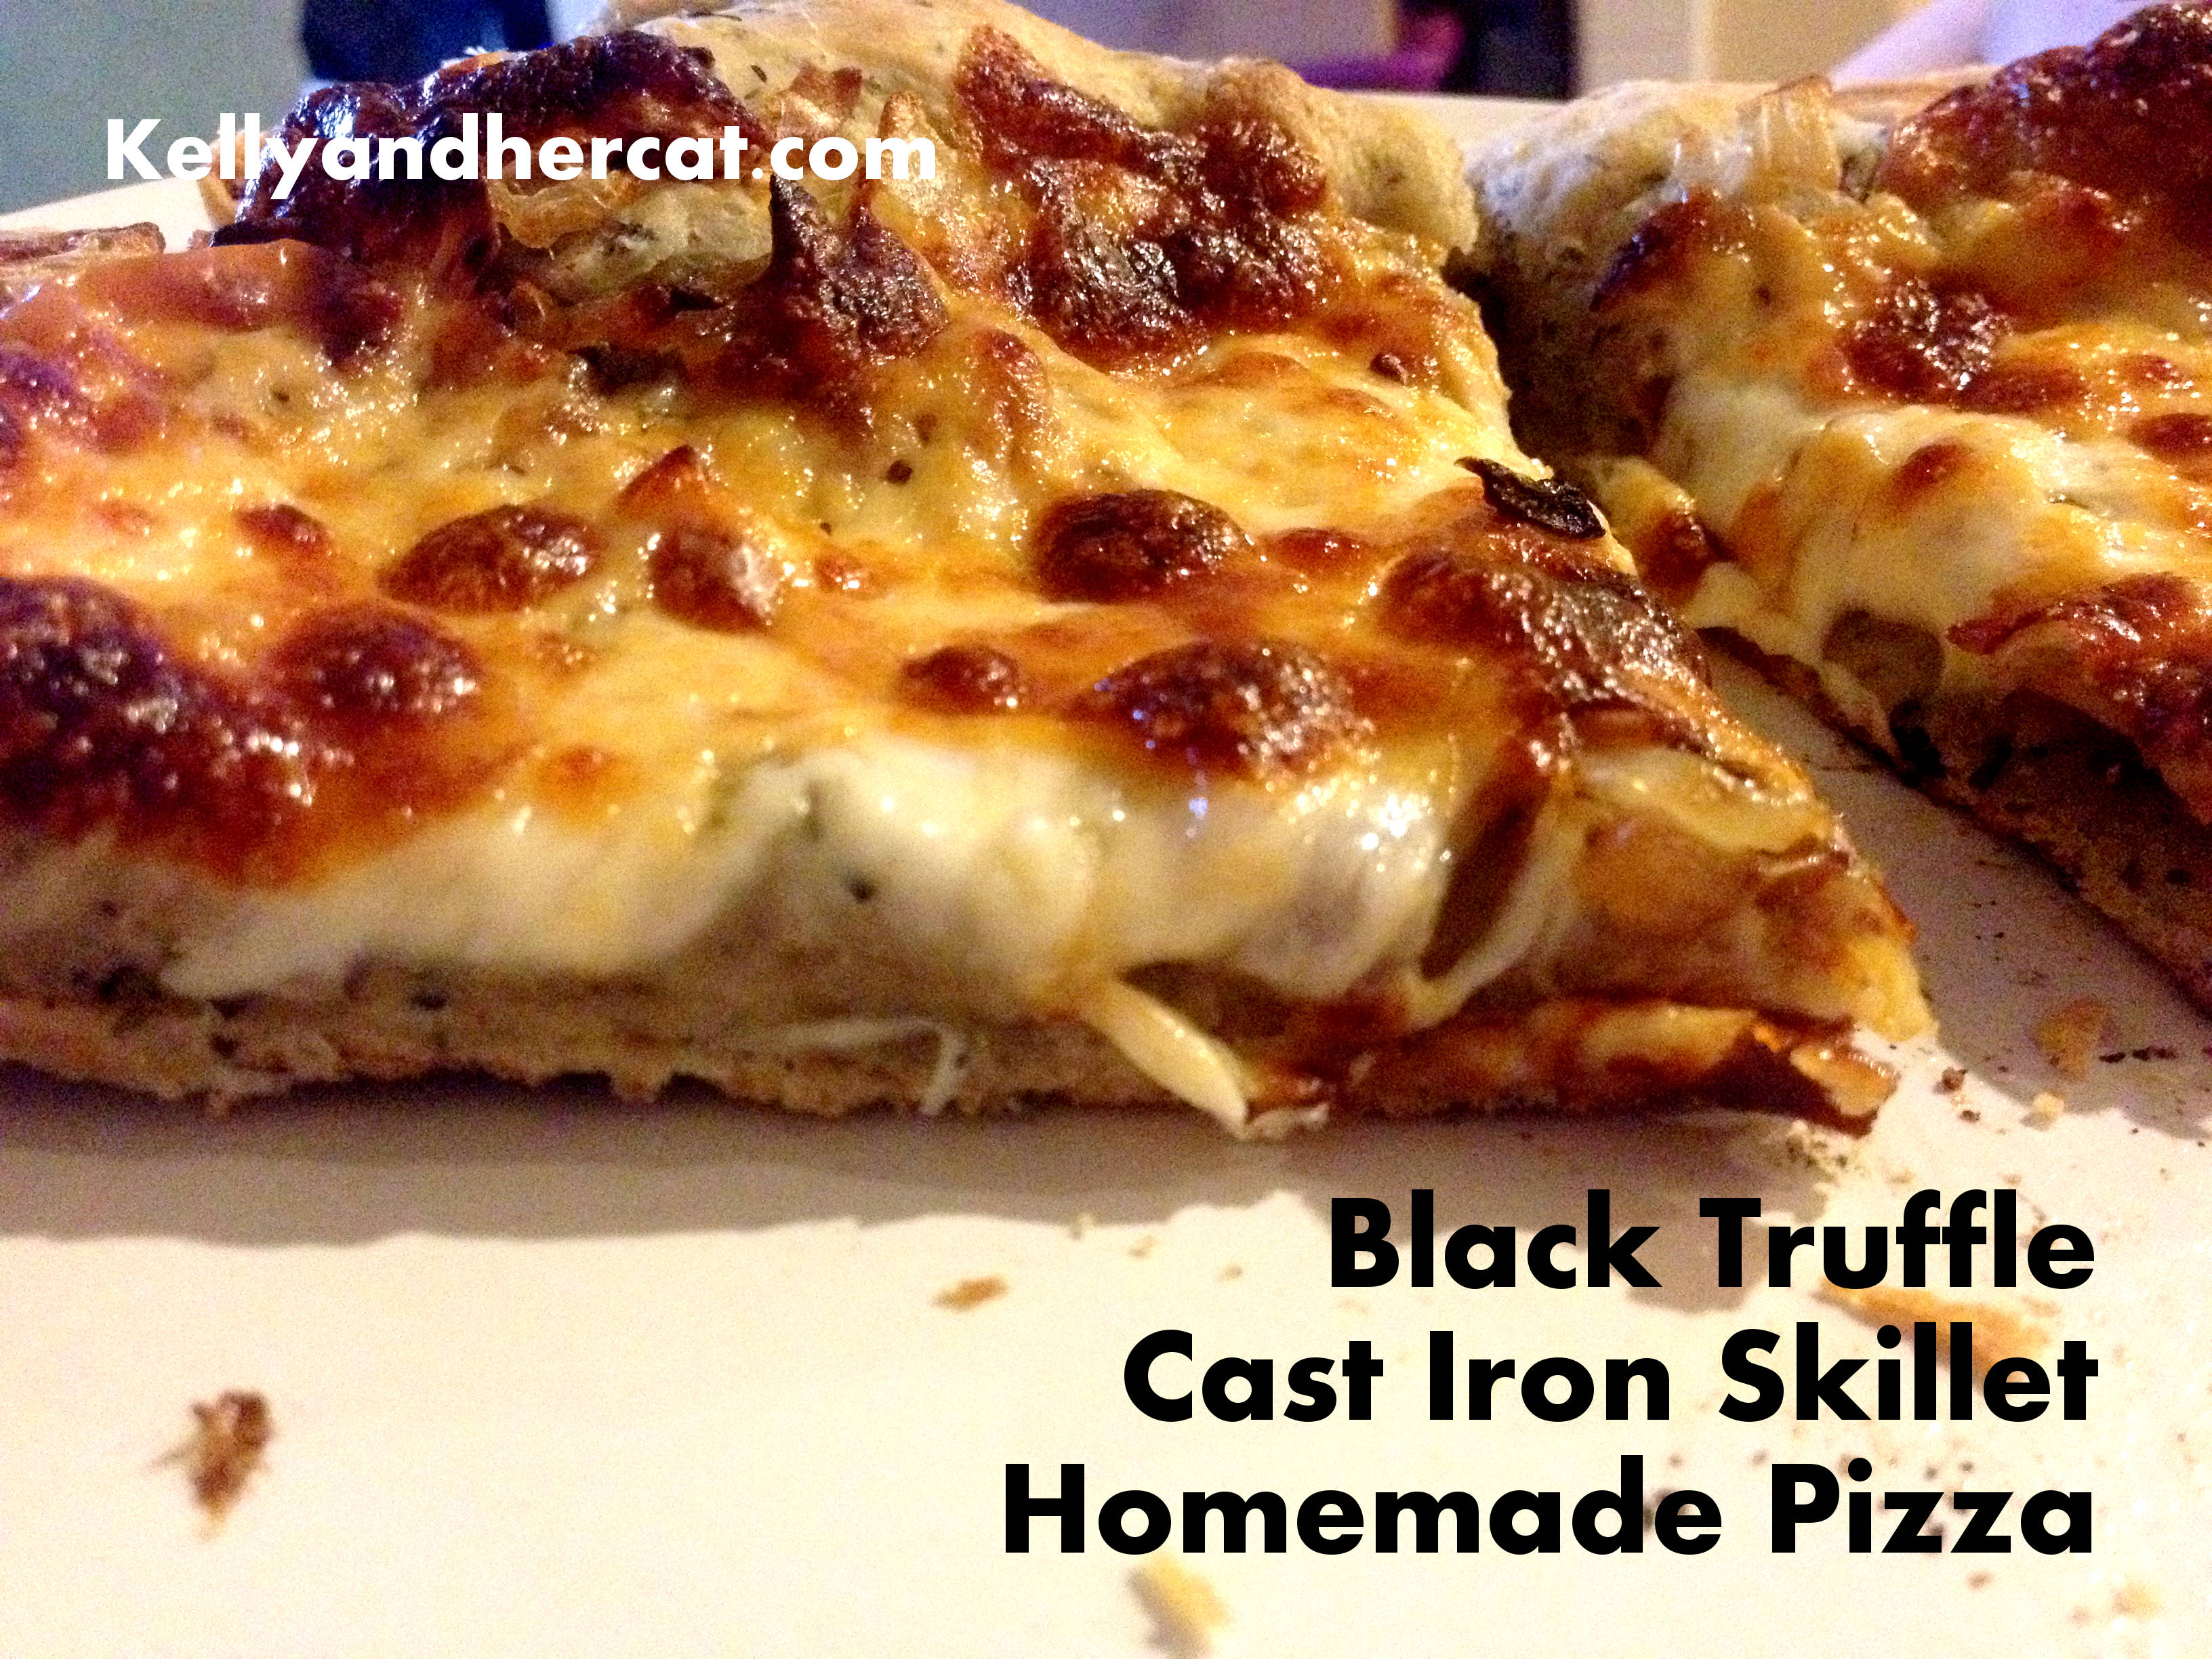 Black Truffle Garlic Pizza